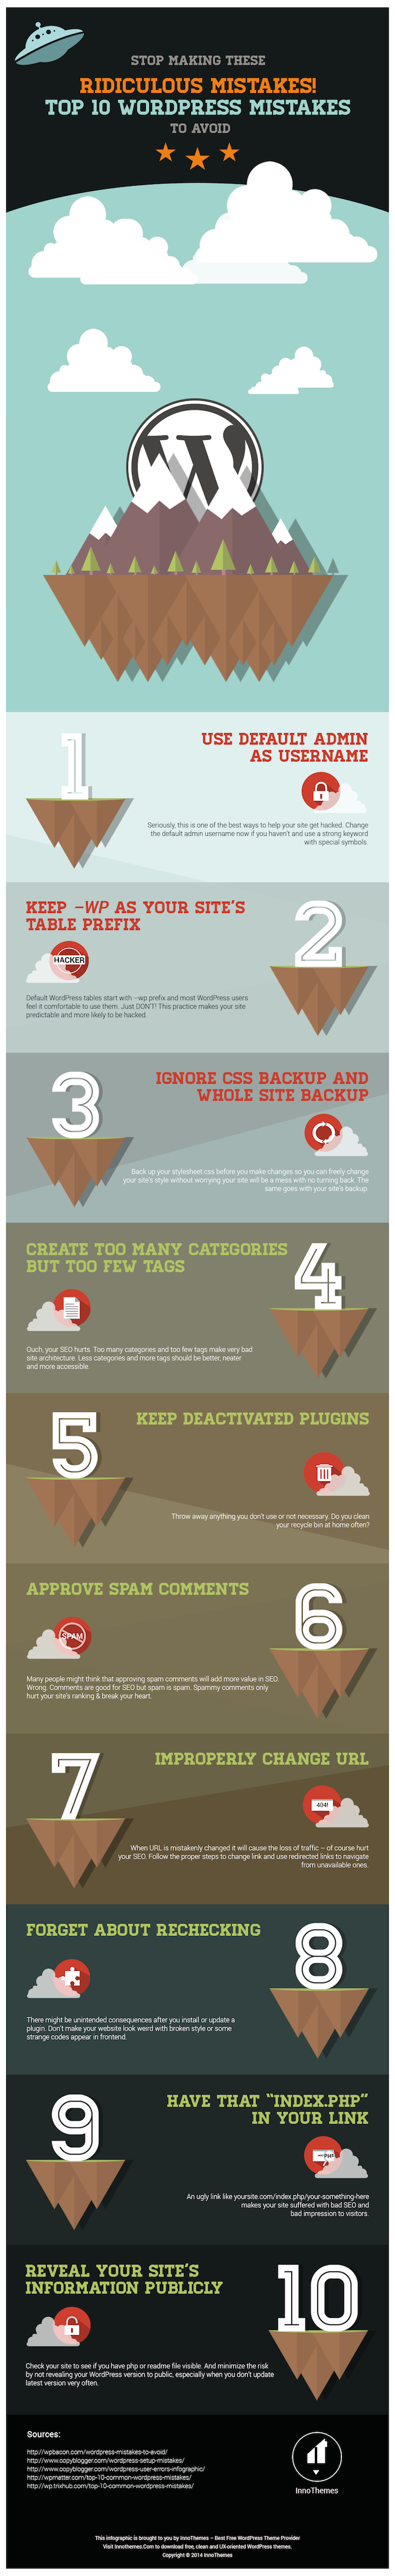 Top WordPress Mistakes to Avoid